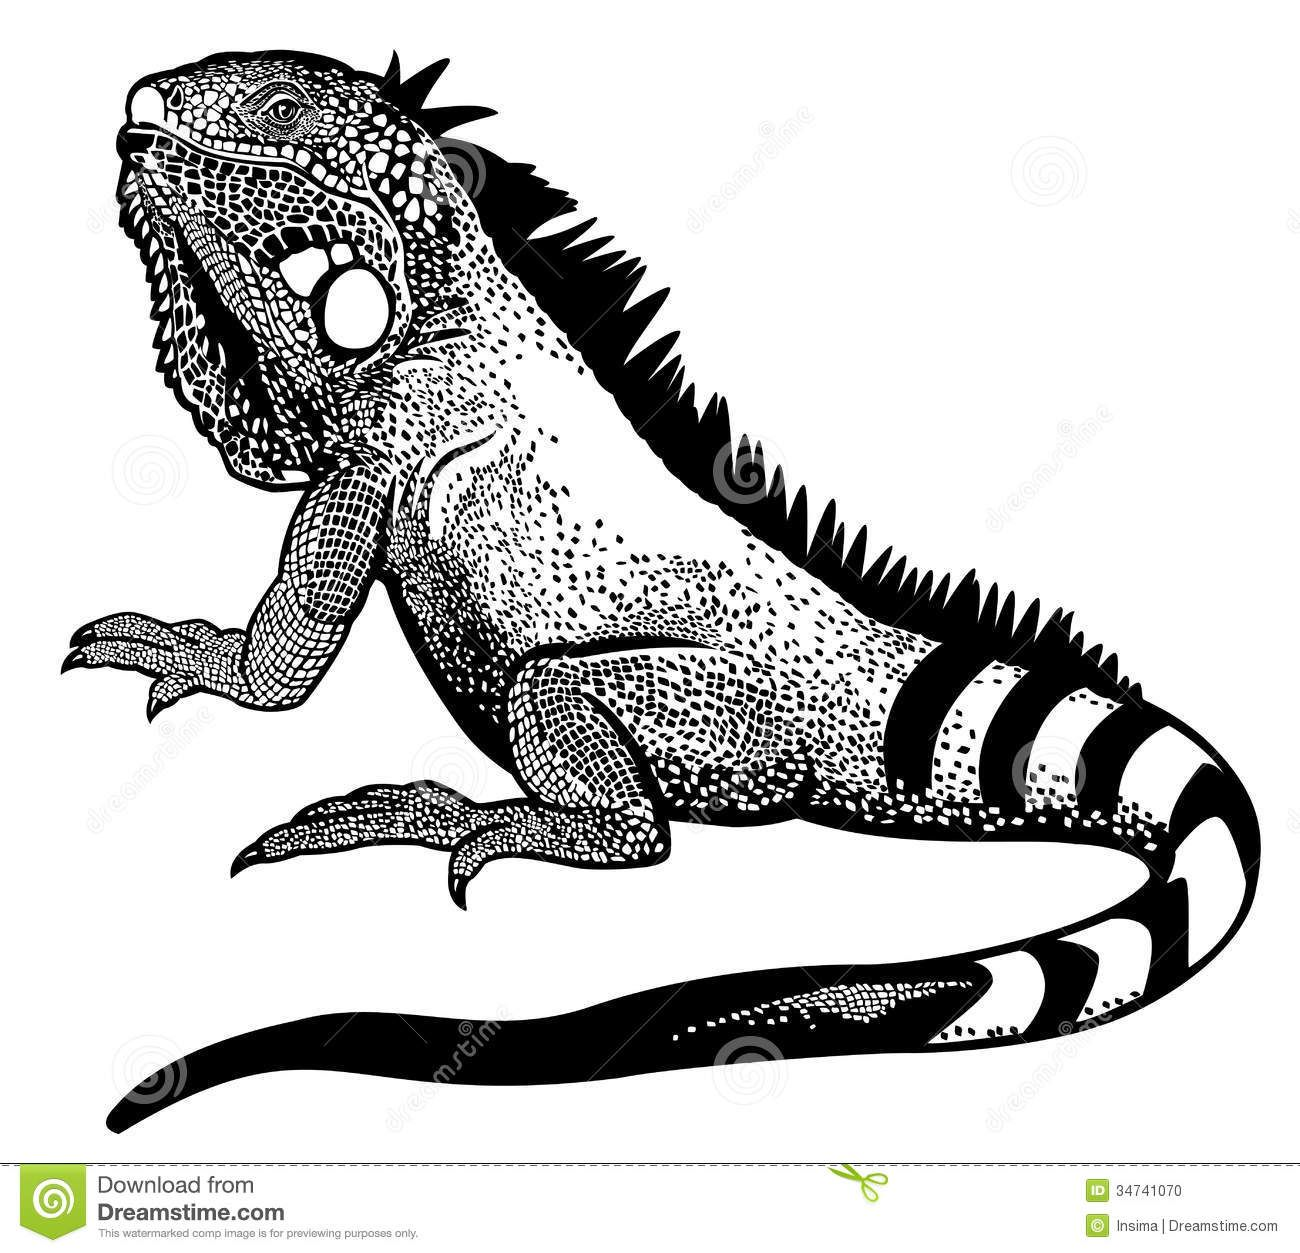 Iguana Clipart Google Search Black And White Illustration Green Iguana Lizard